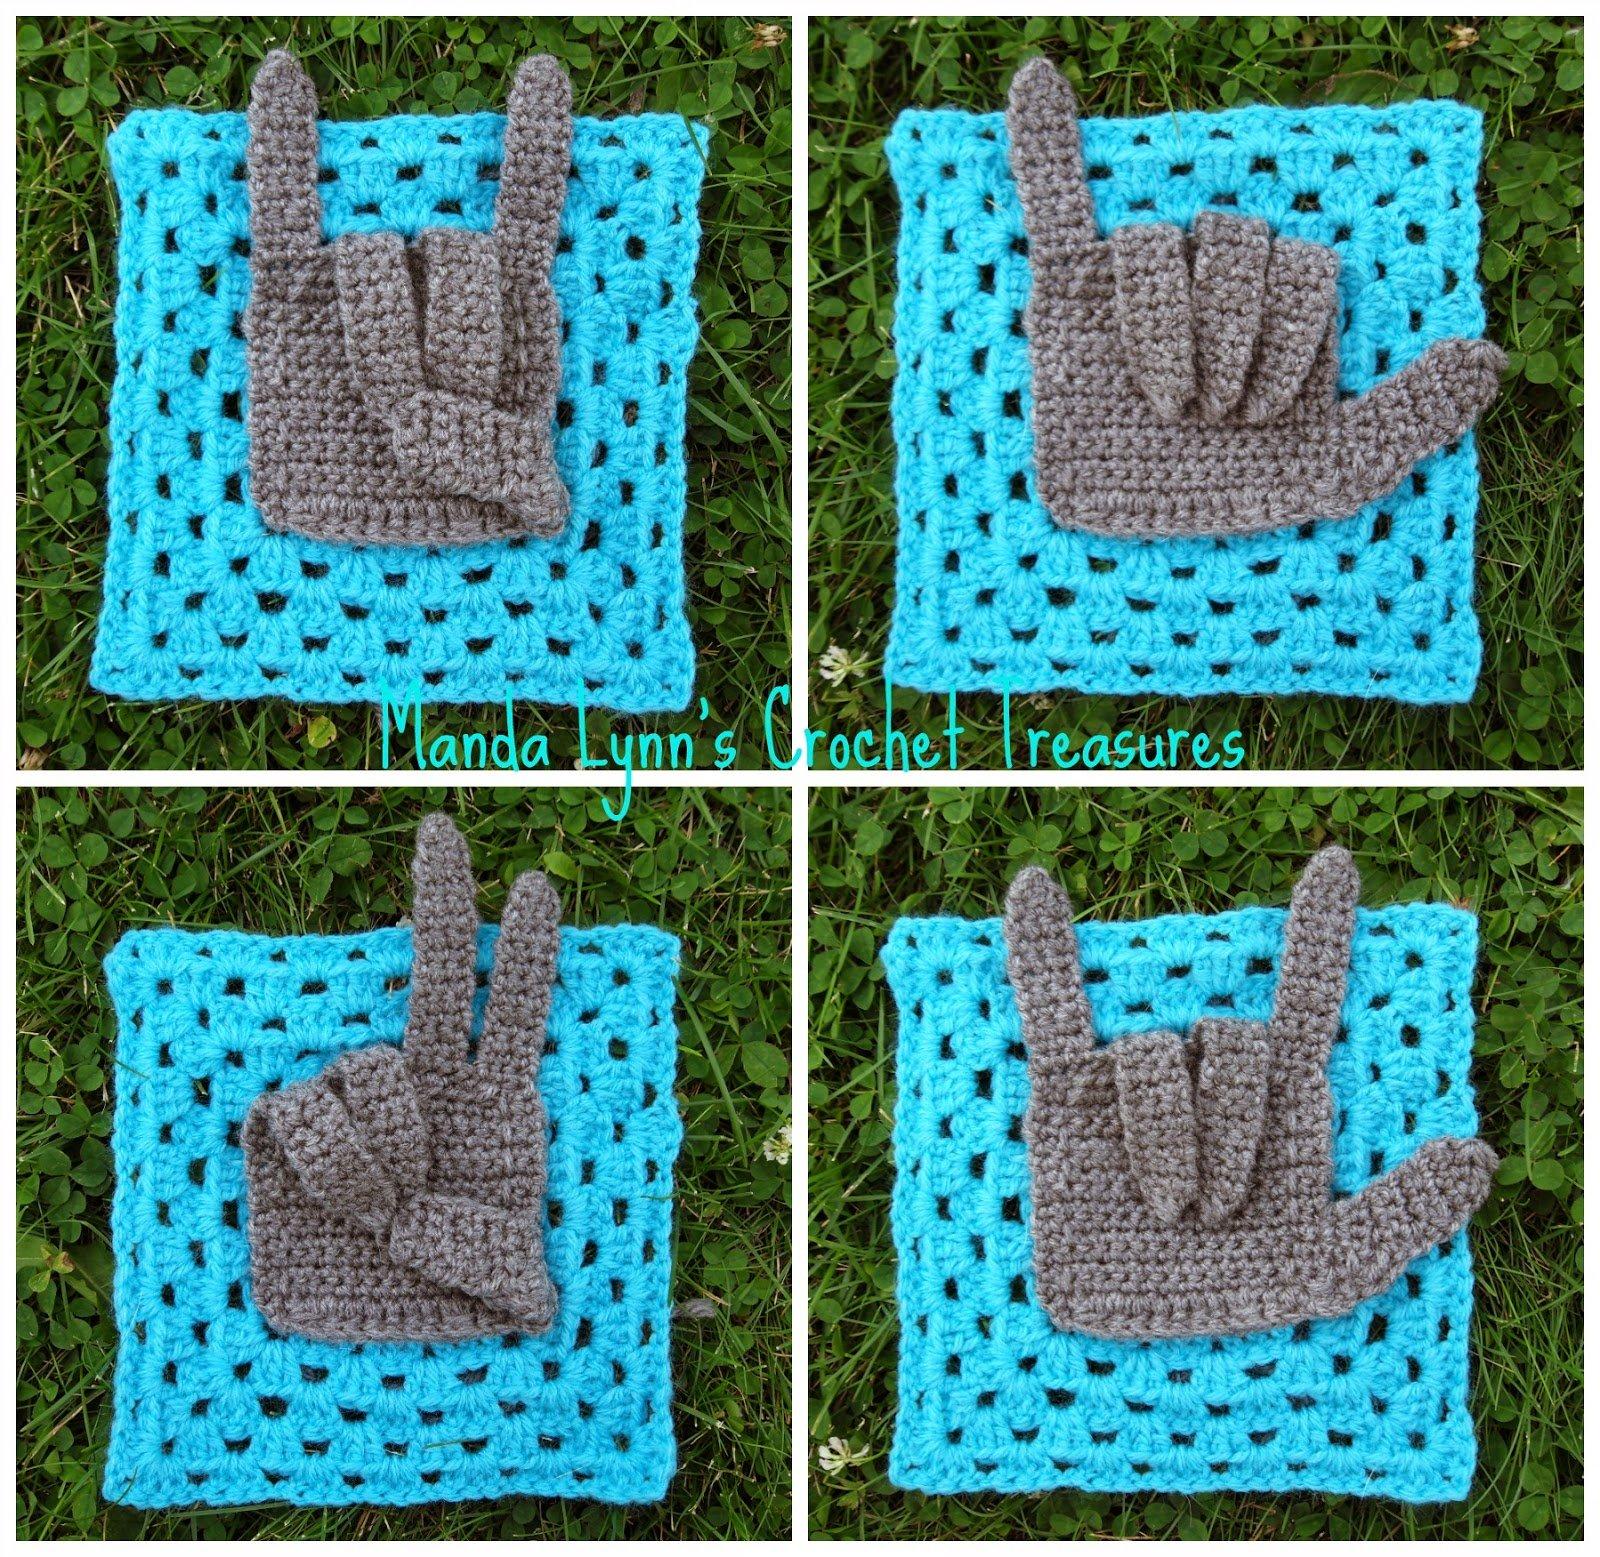 Give Granny A Hand by Manda Proell of MandaLynn's Crochet Treasures